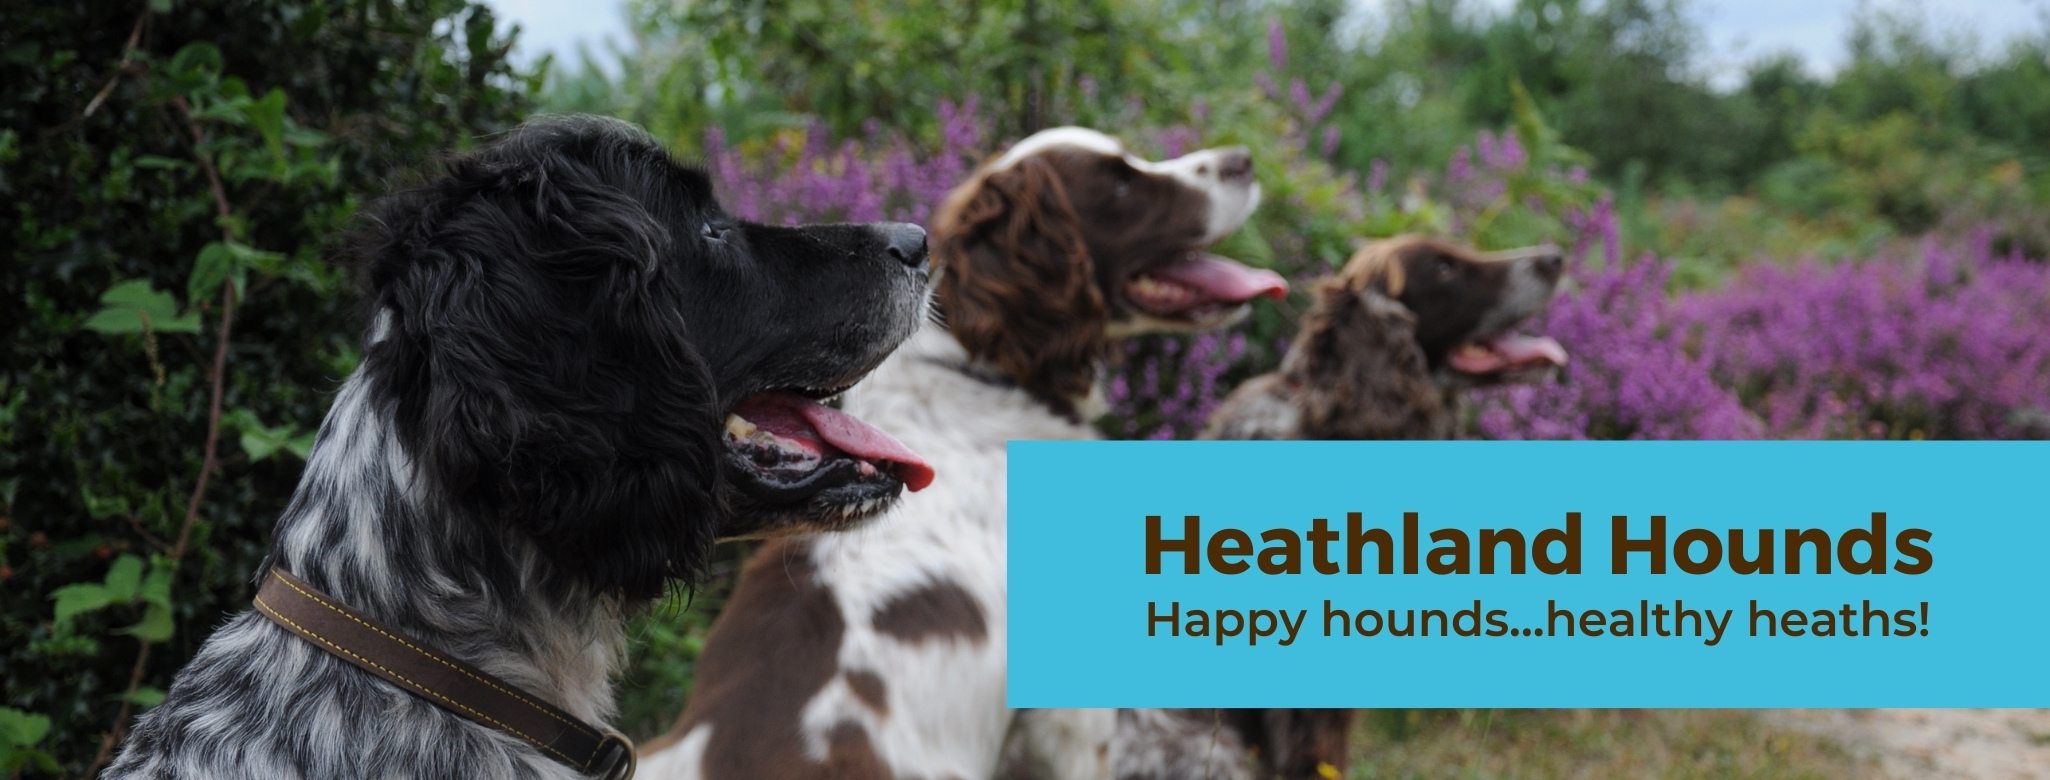 "Heathland Hounds ""Happy hounds...healthy heaths"""